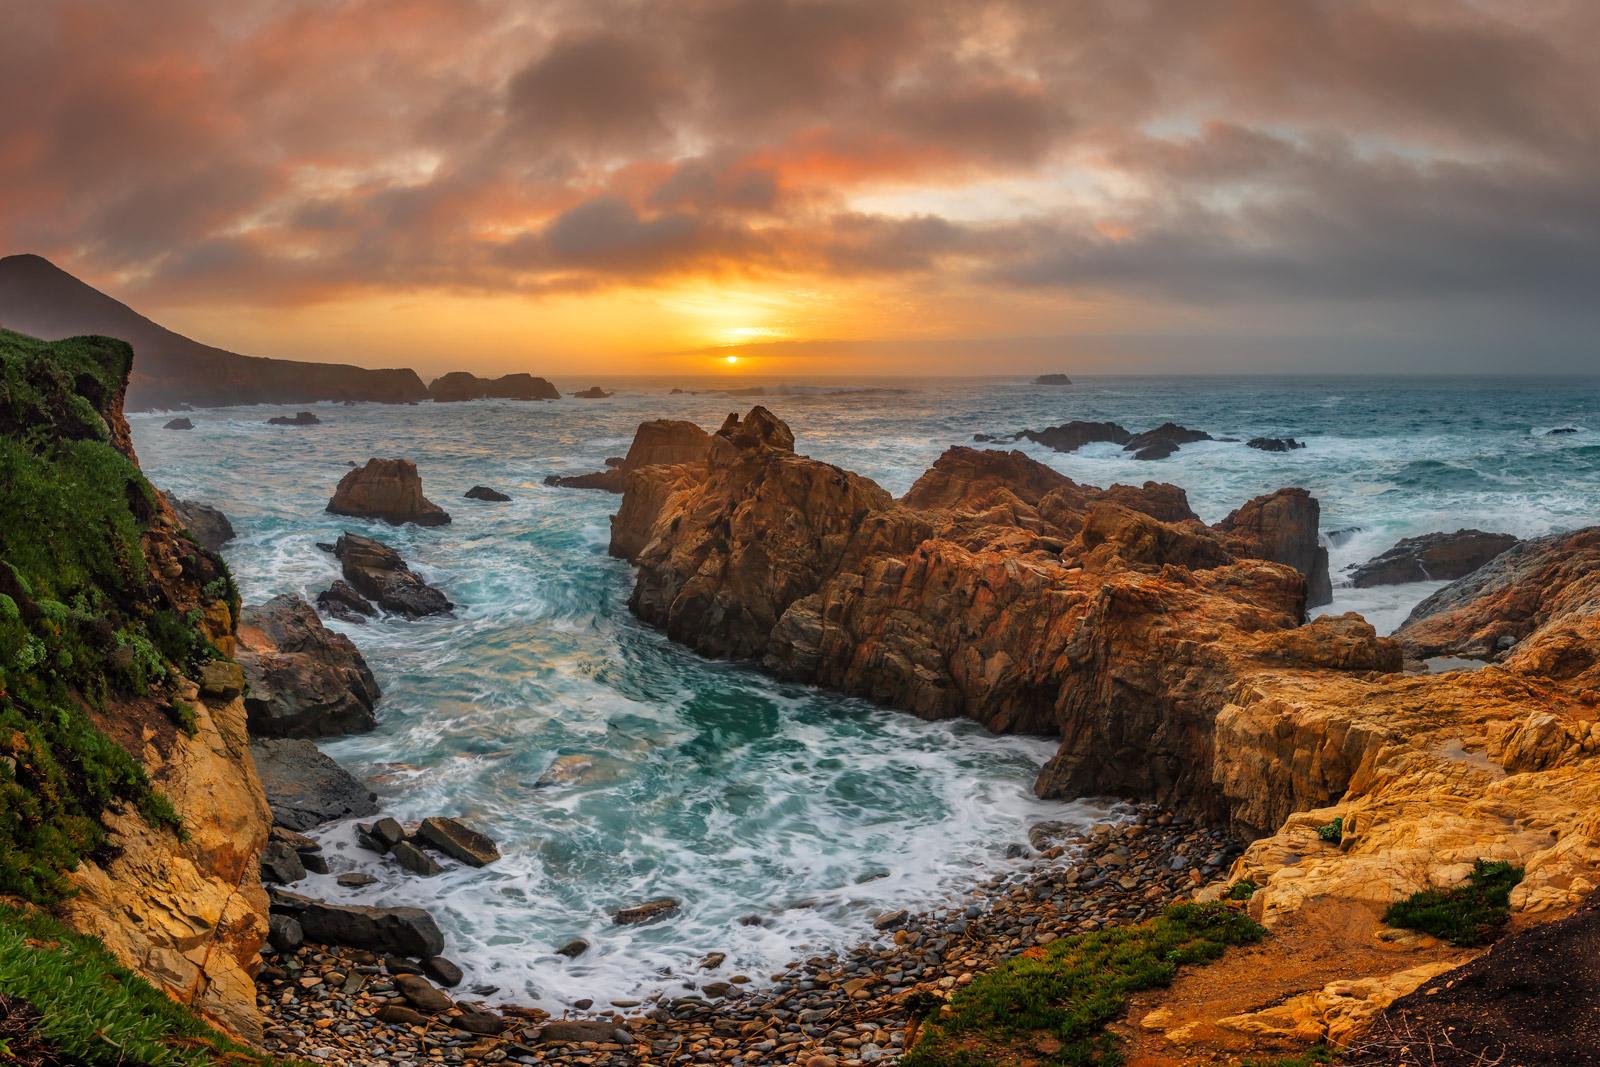 California, Big Sur, Sunset, Garrapata, Soberanes, limited edition, photograph, fine art, landscape, coast, photo